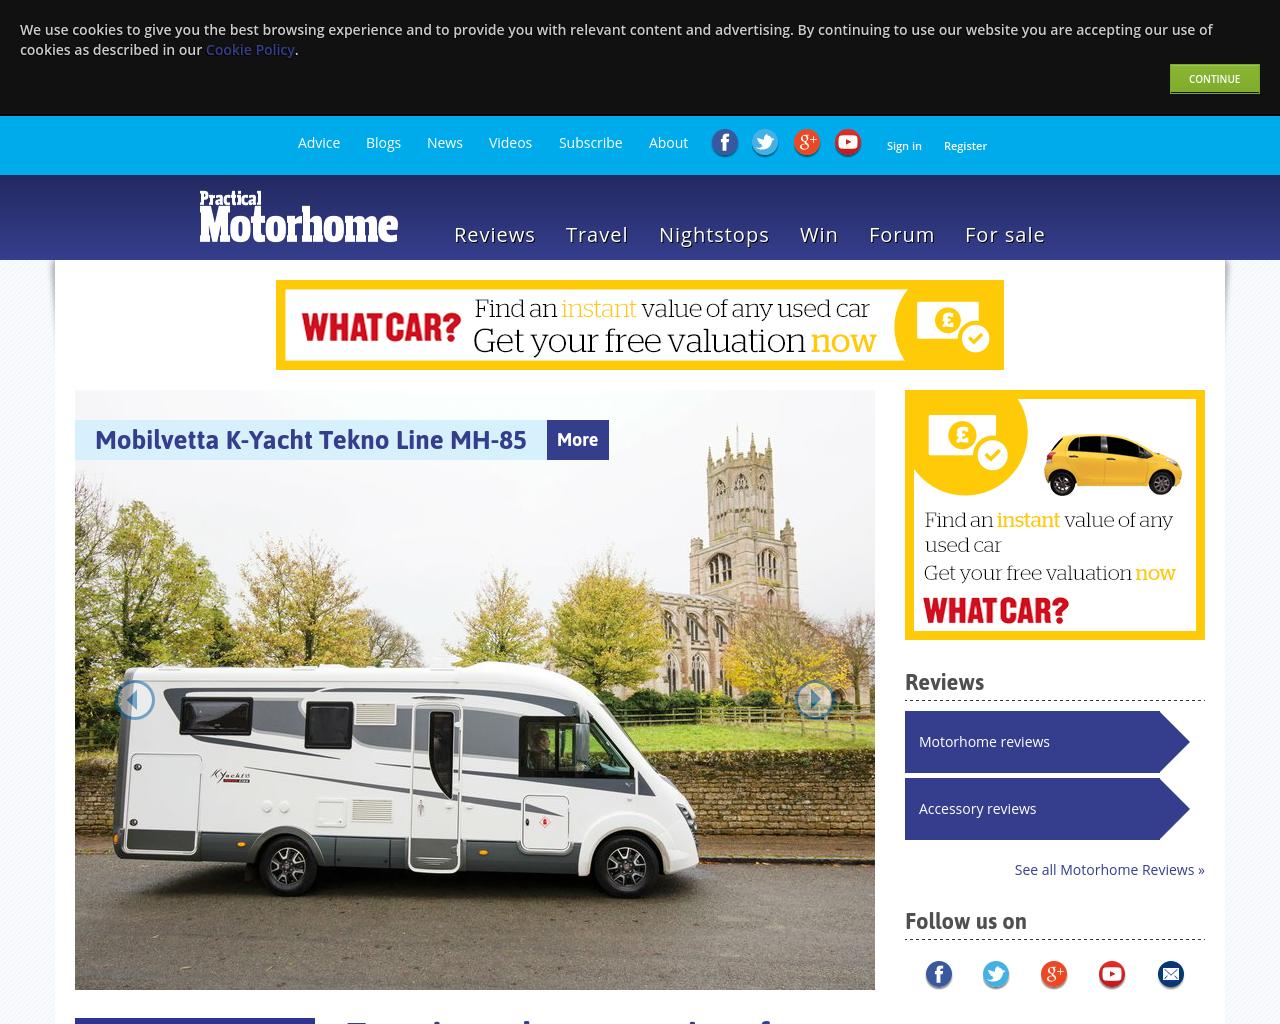 Practical-Motorhome-Advertising-Reviews-Pricing